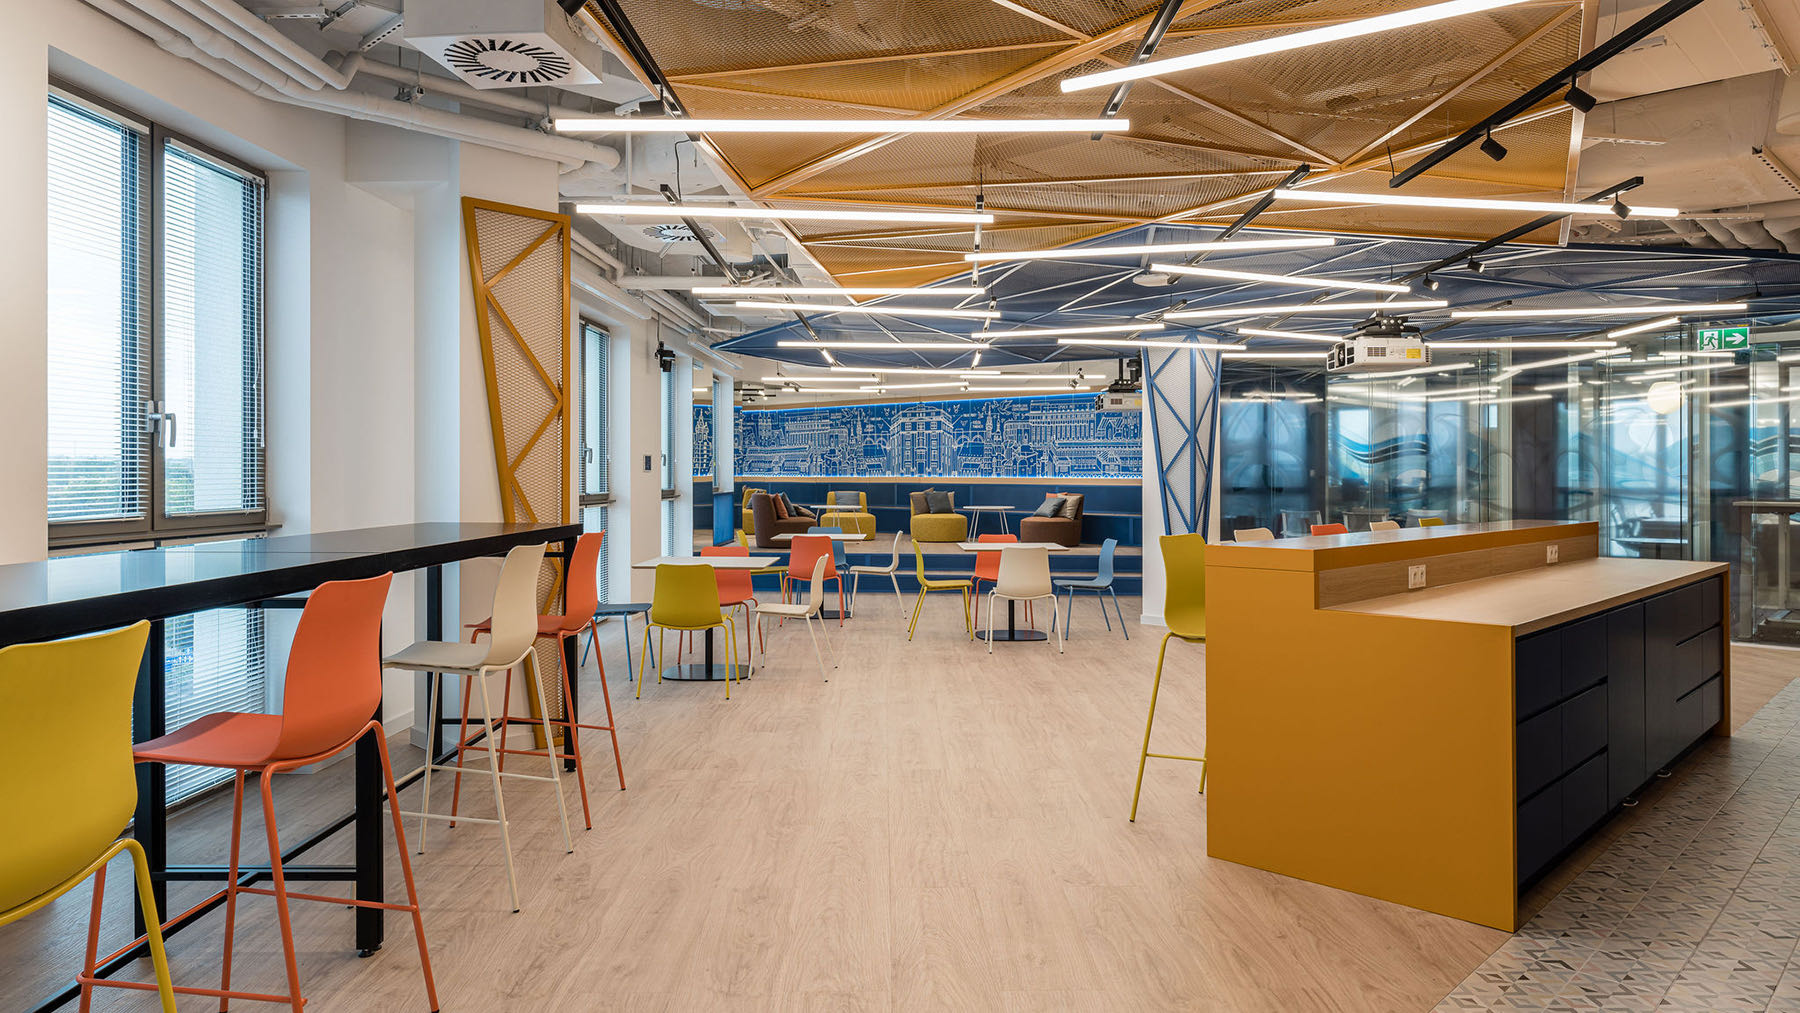 autodesk-krakow-office-36